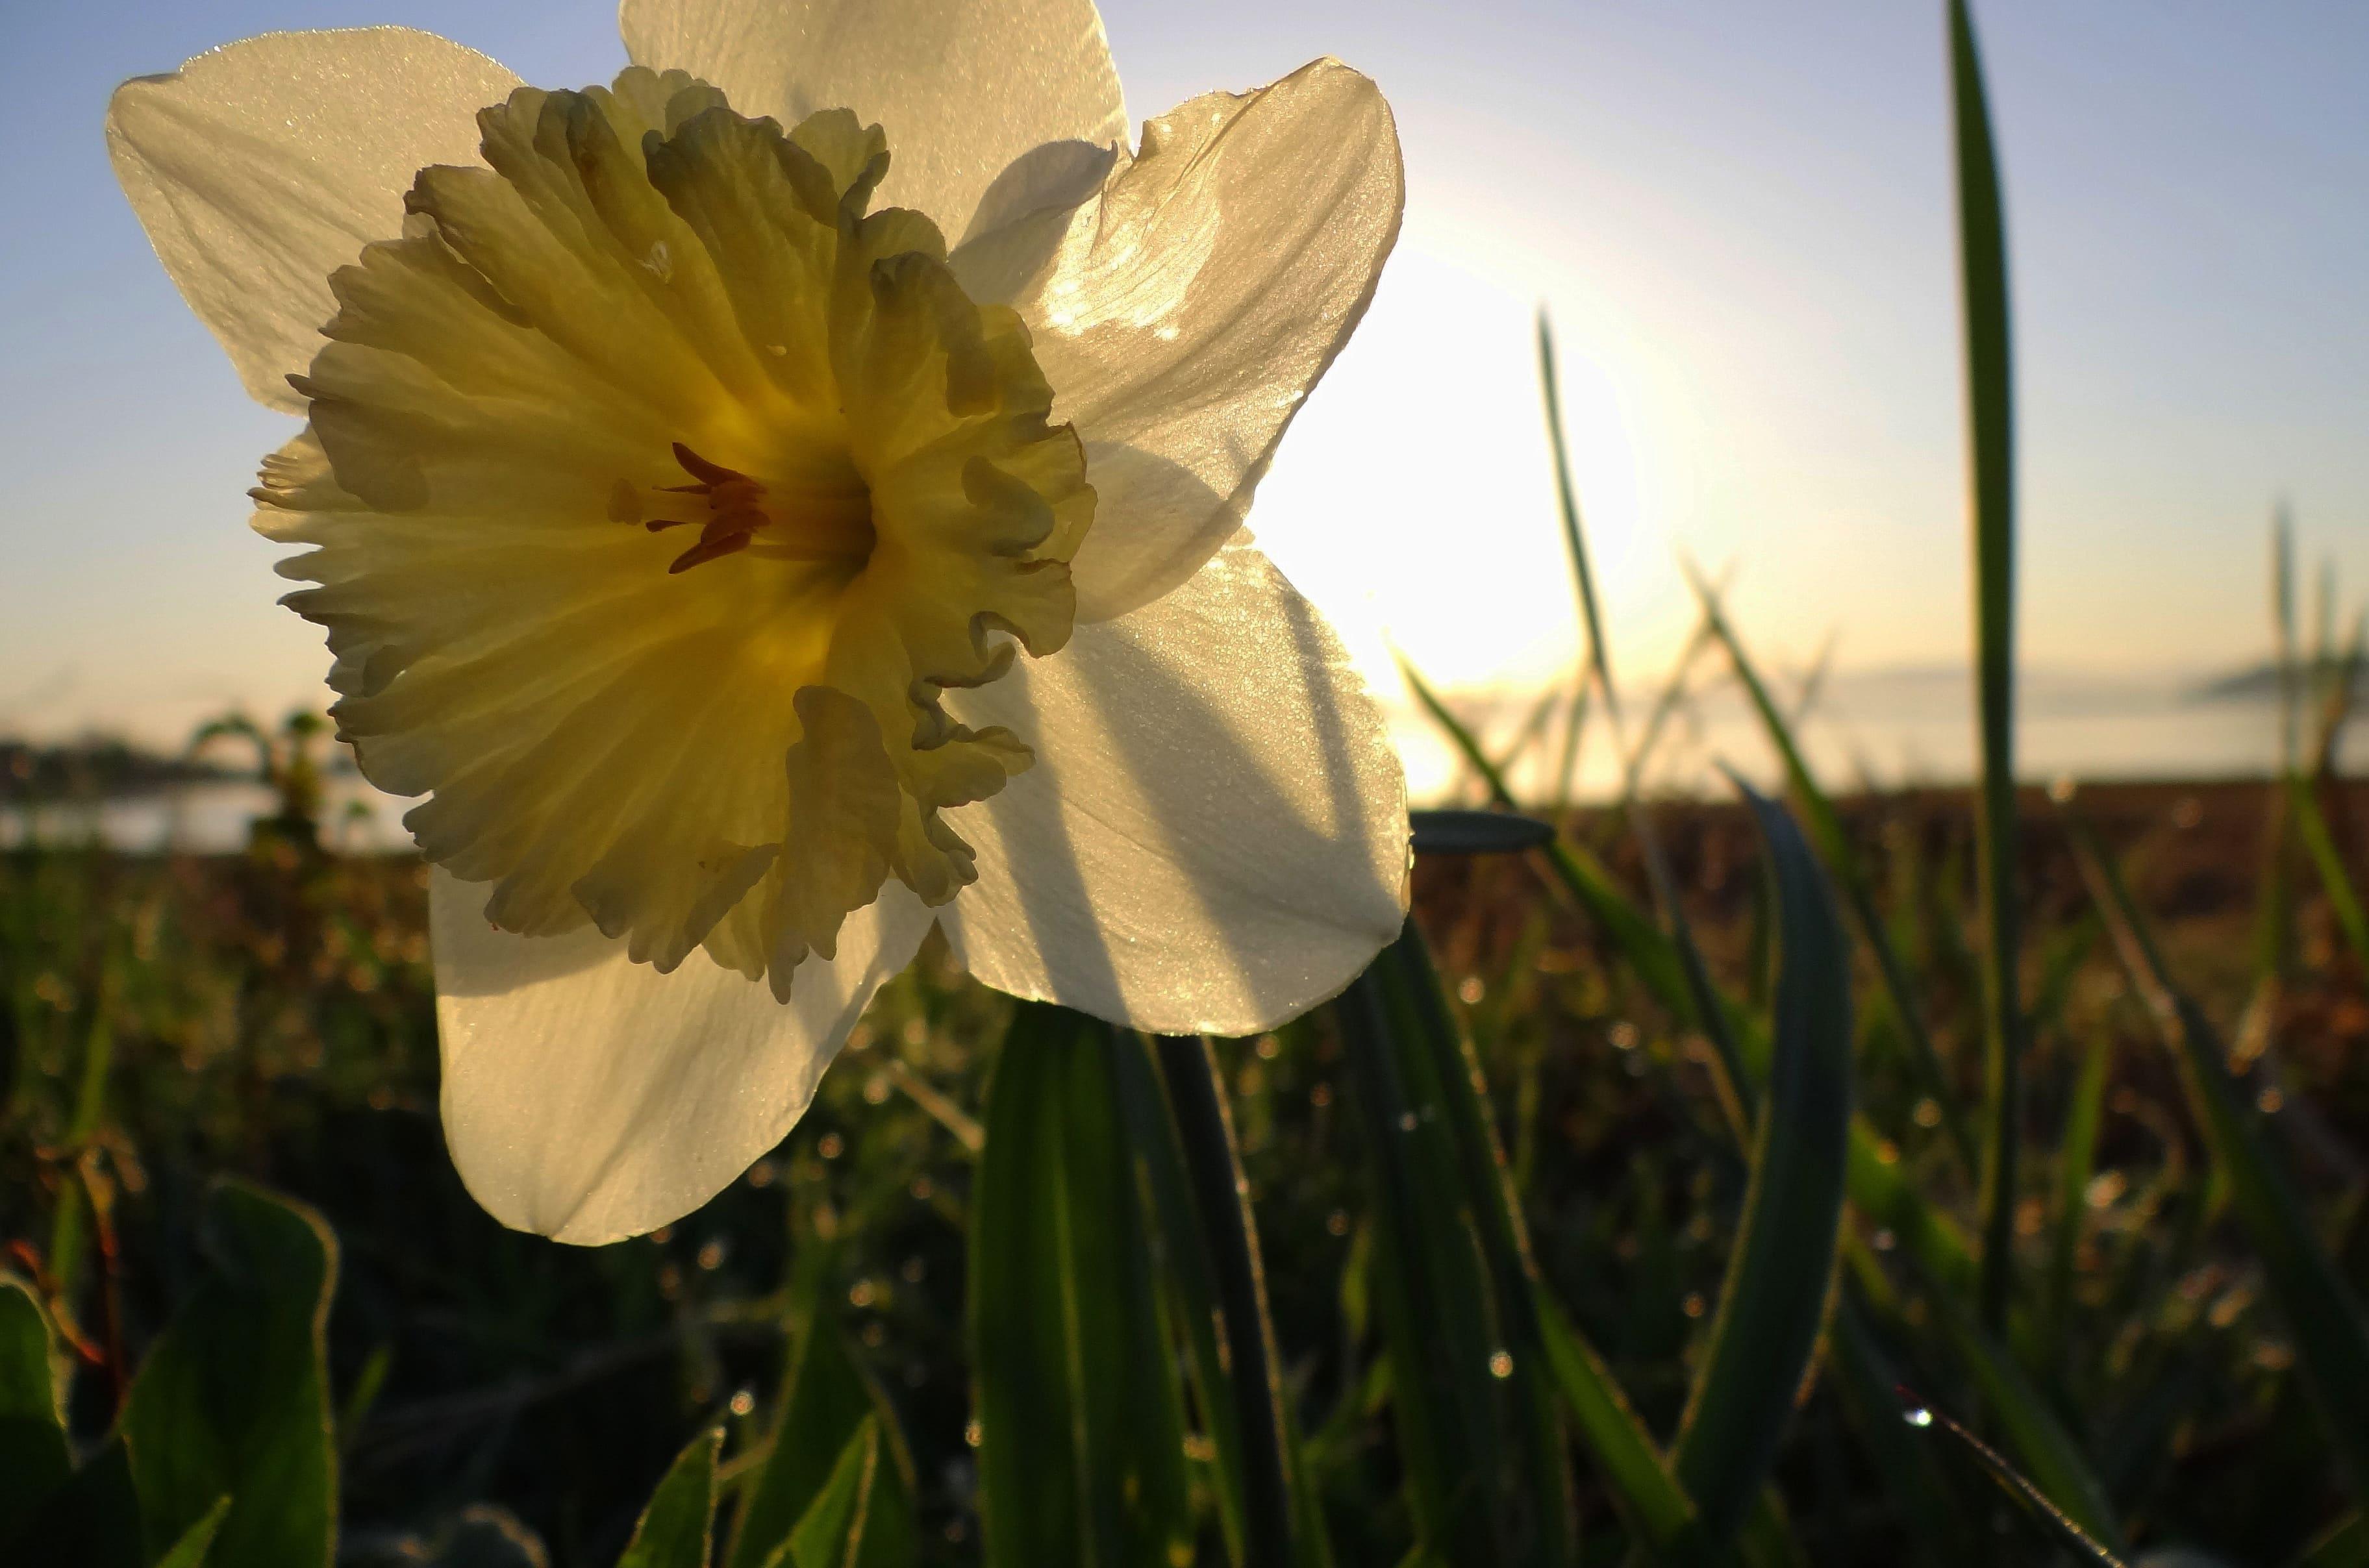 daffodils-photo-39